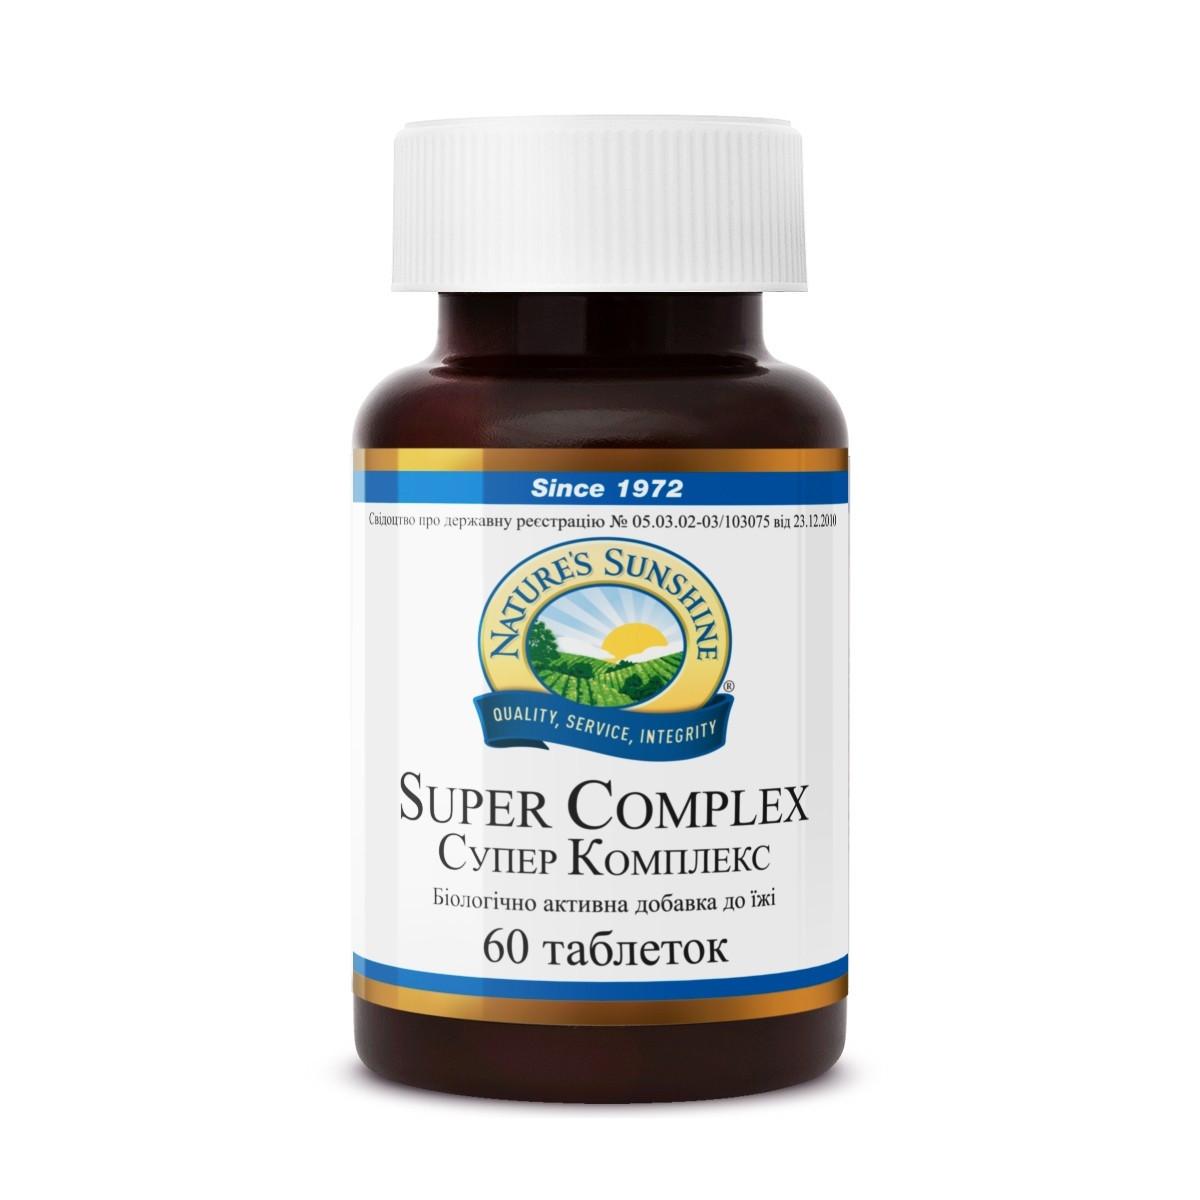 Супер Комплекс. Super Complex